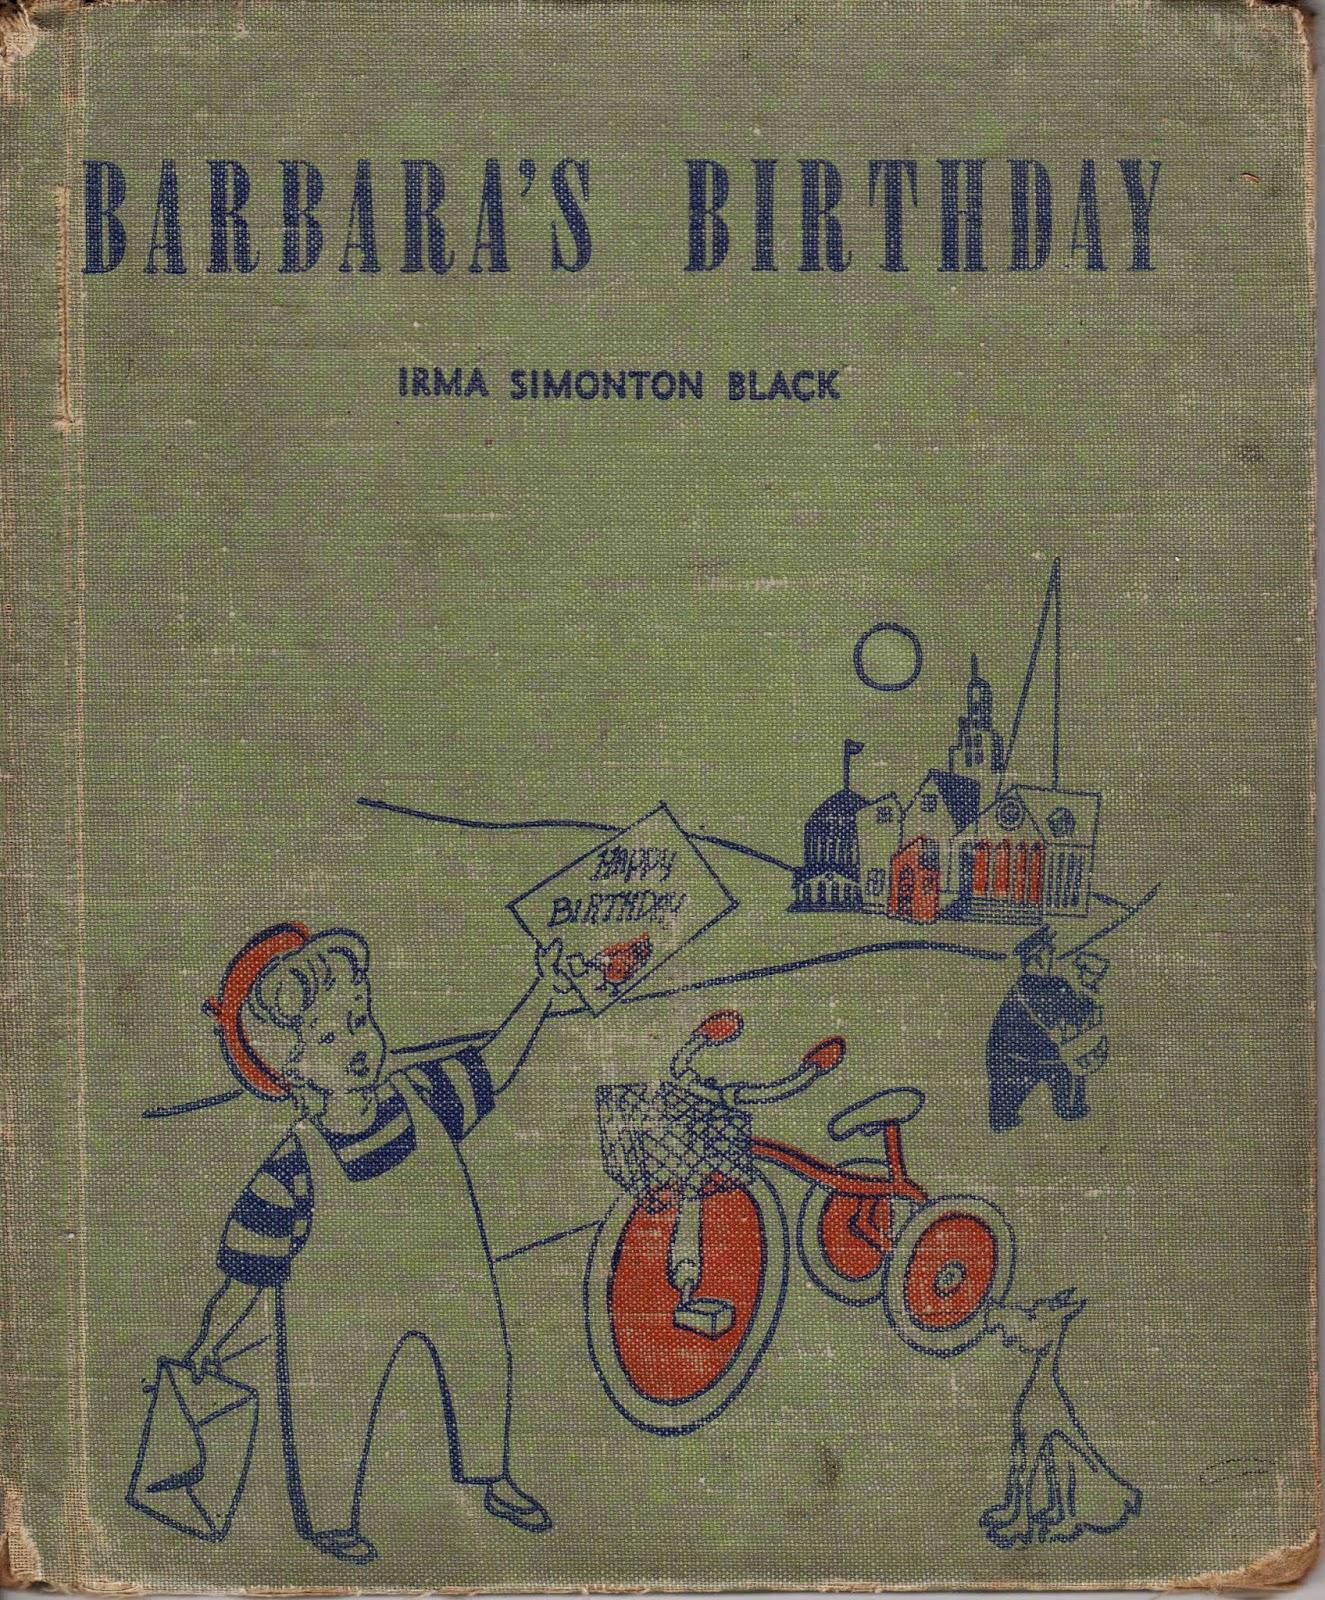 Birthday party bunch plough